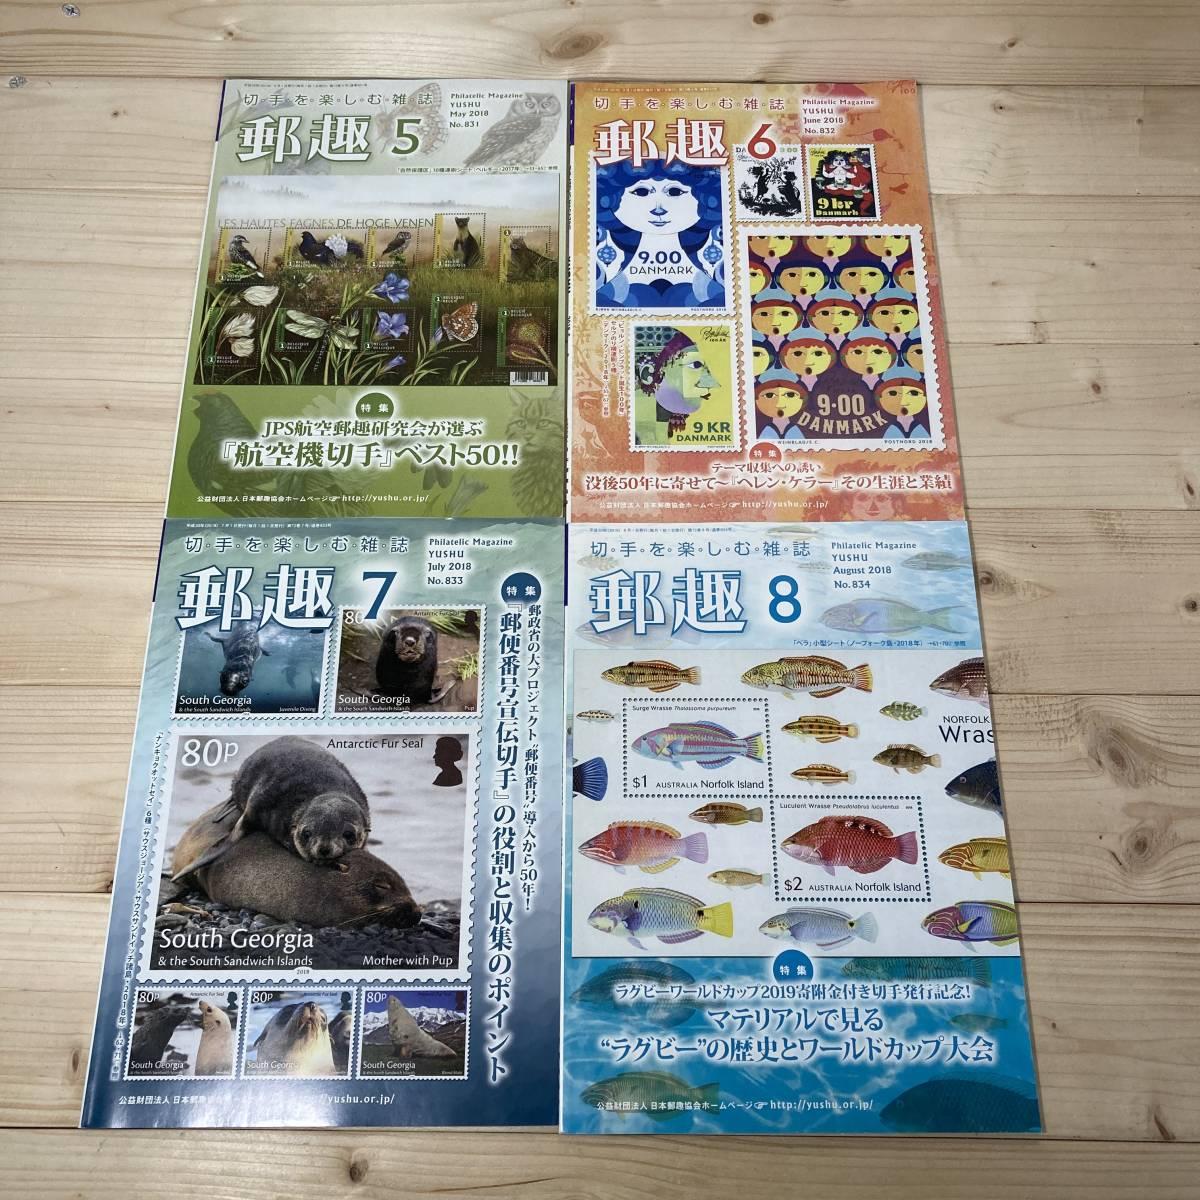 SA12-45 郵趣 2018年1月~12月 12冊セット / 日本郵趣協会刊_画像3